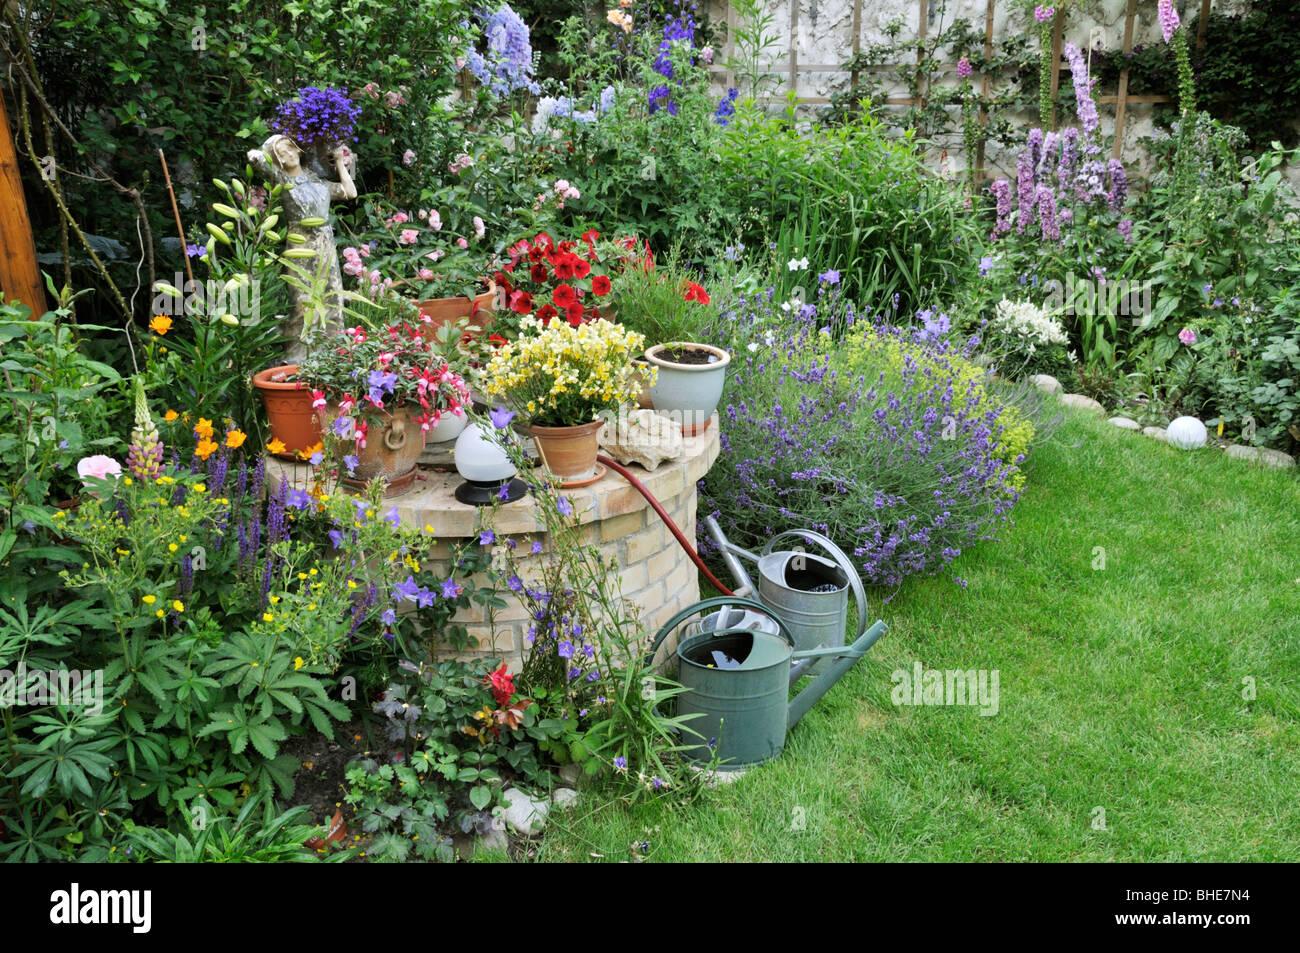 Perennial Bed And Annual Plants In A Backyard Garden Design Jutta